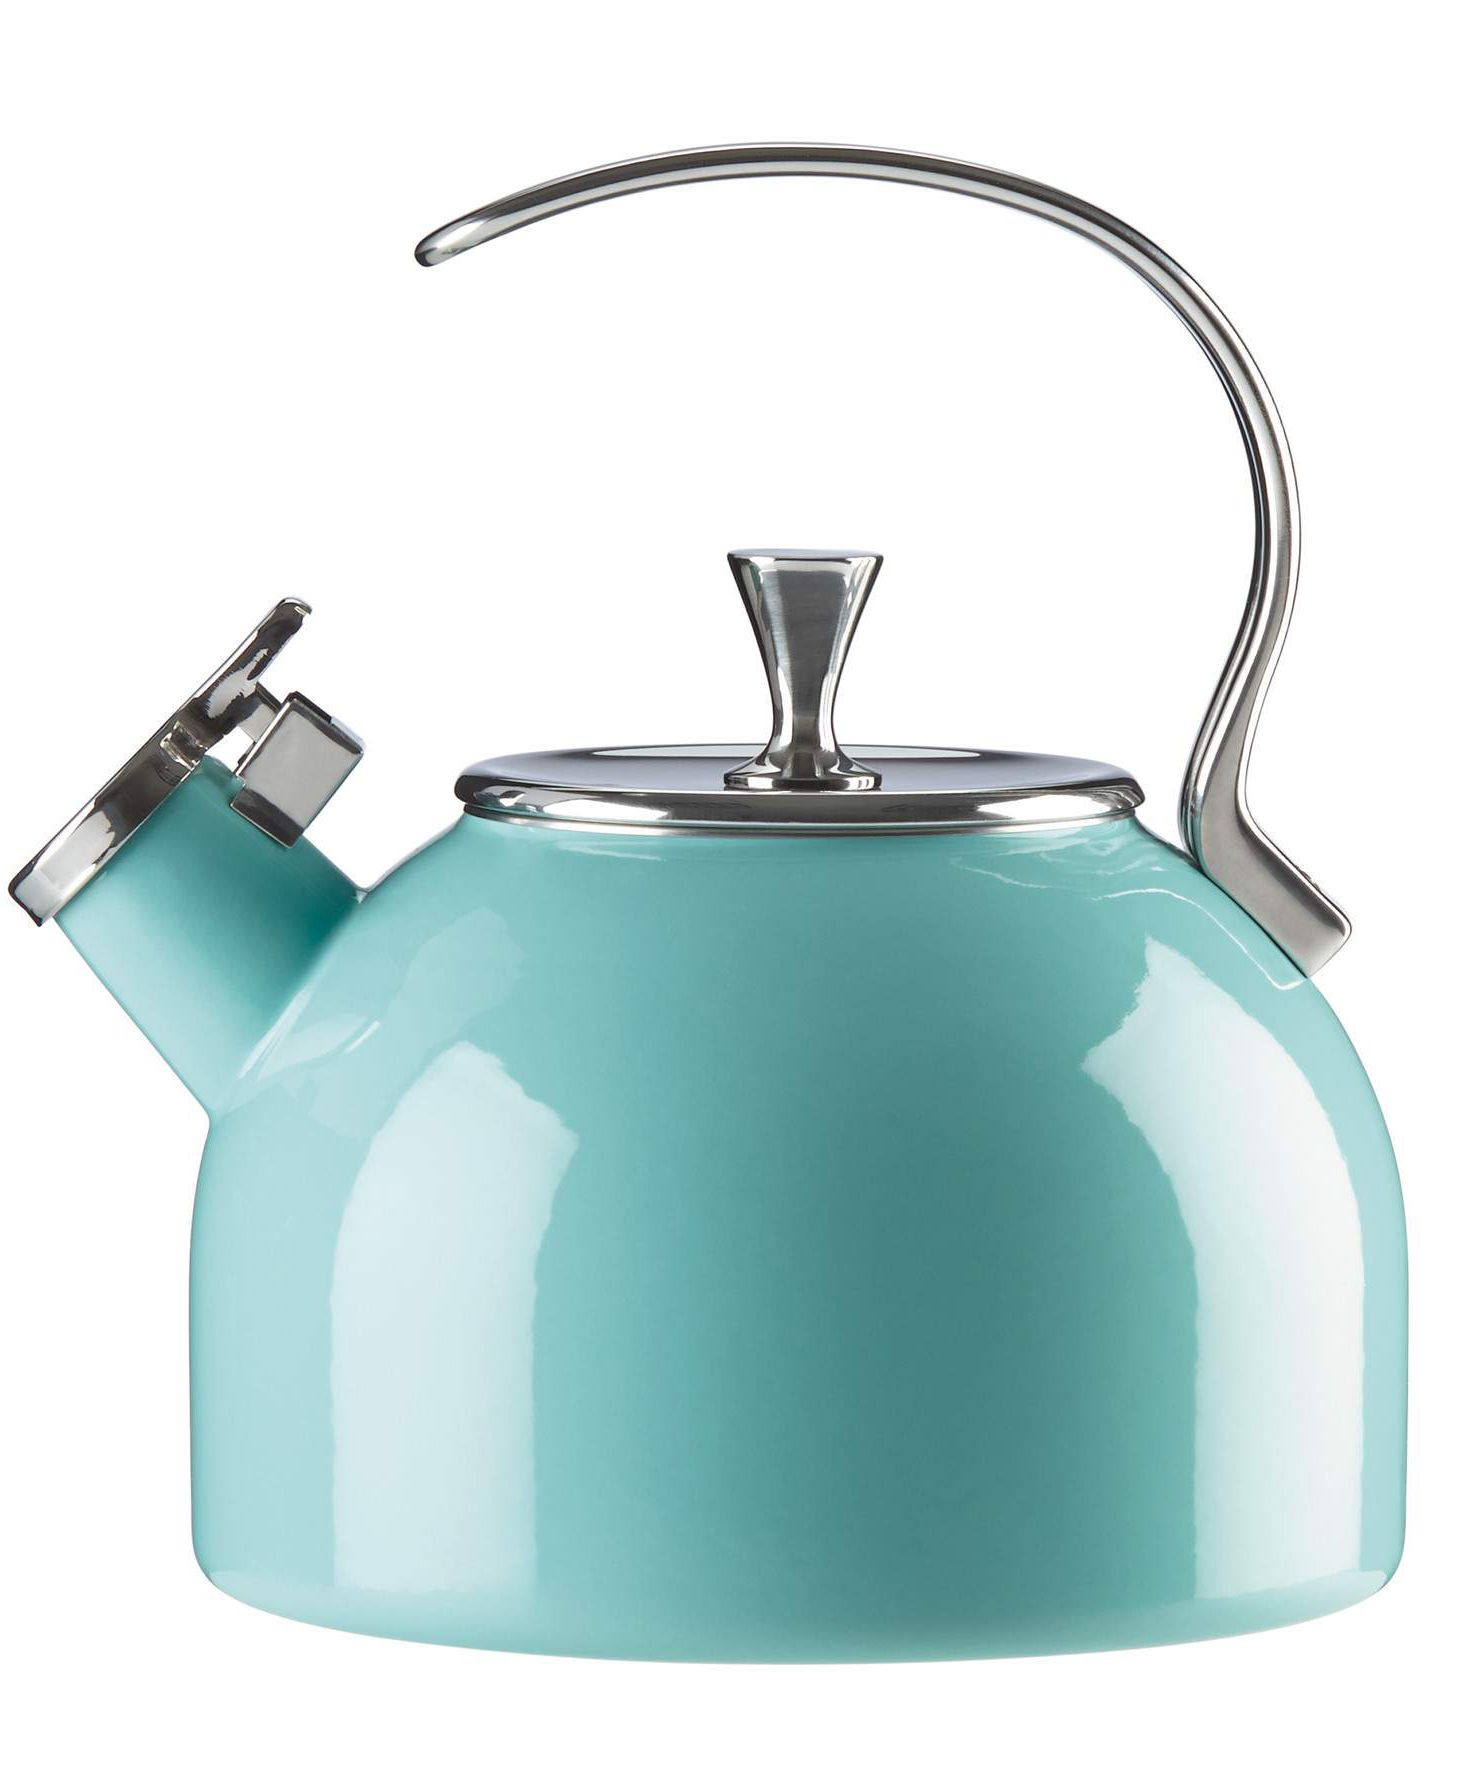 Kate Spade Turquoise Tea Kettle | I Want That! | Pinterest | Türkis ...